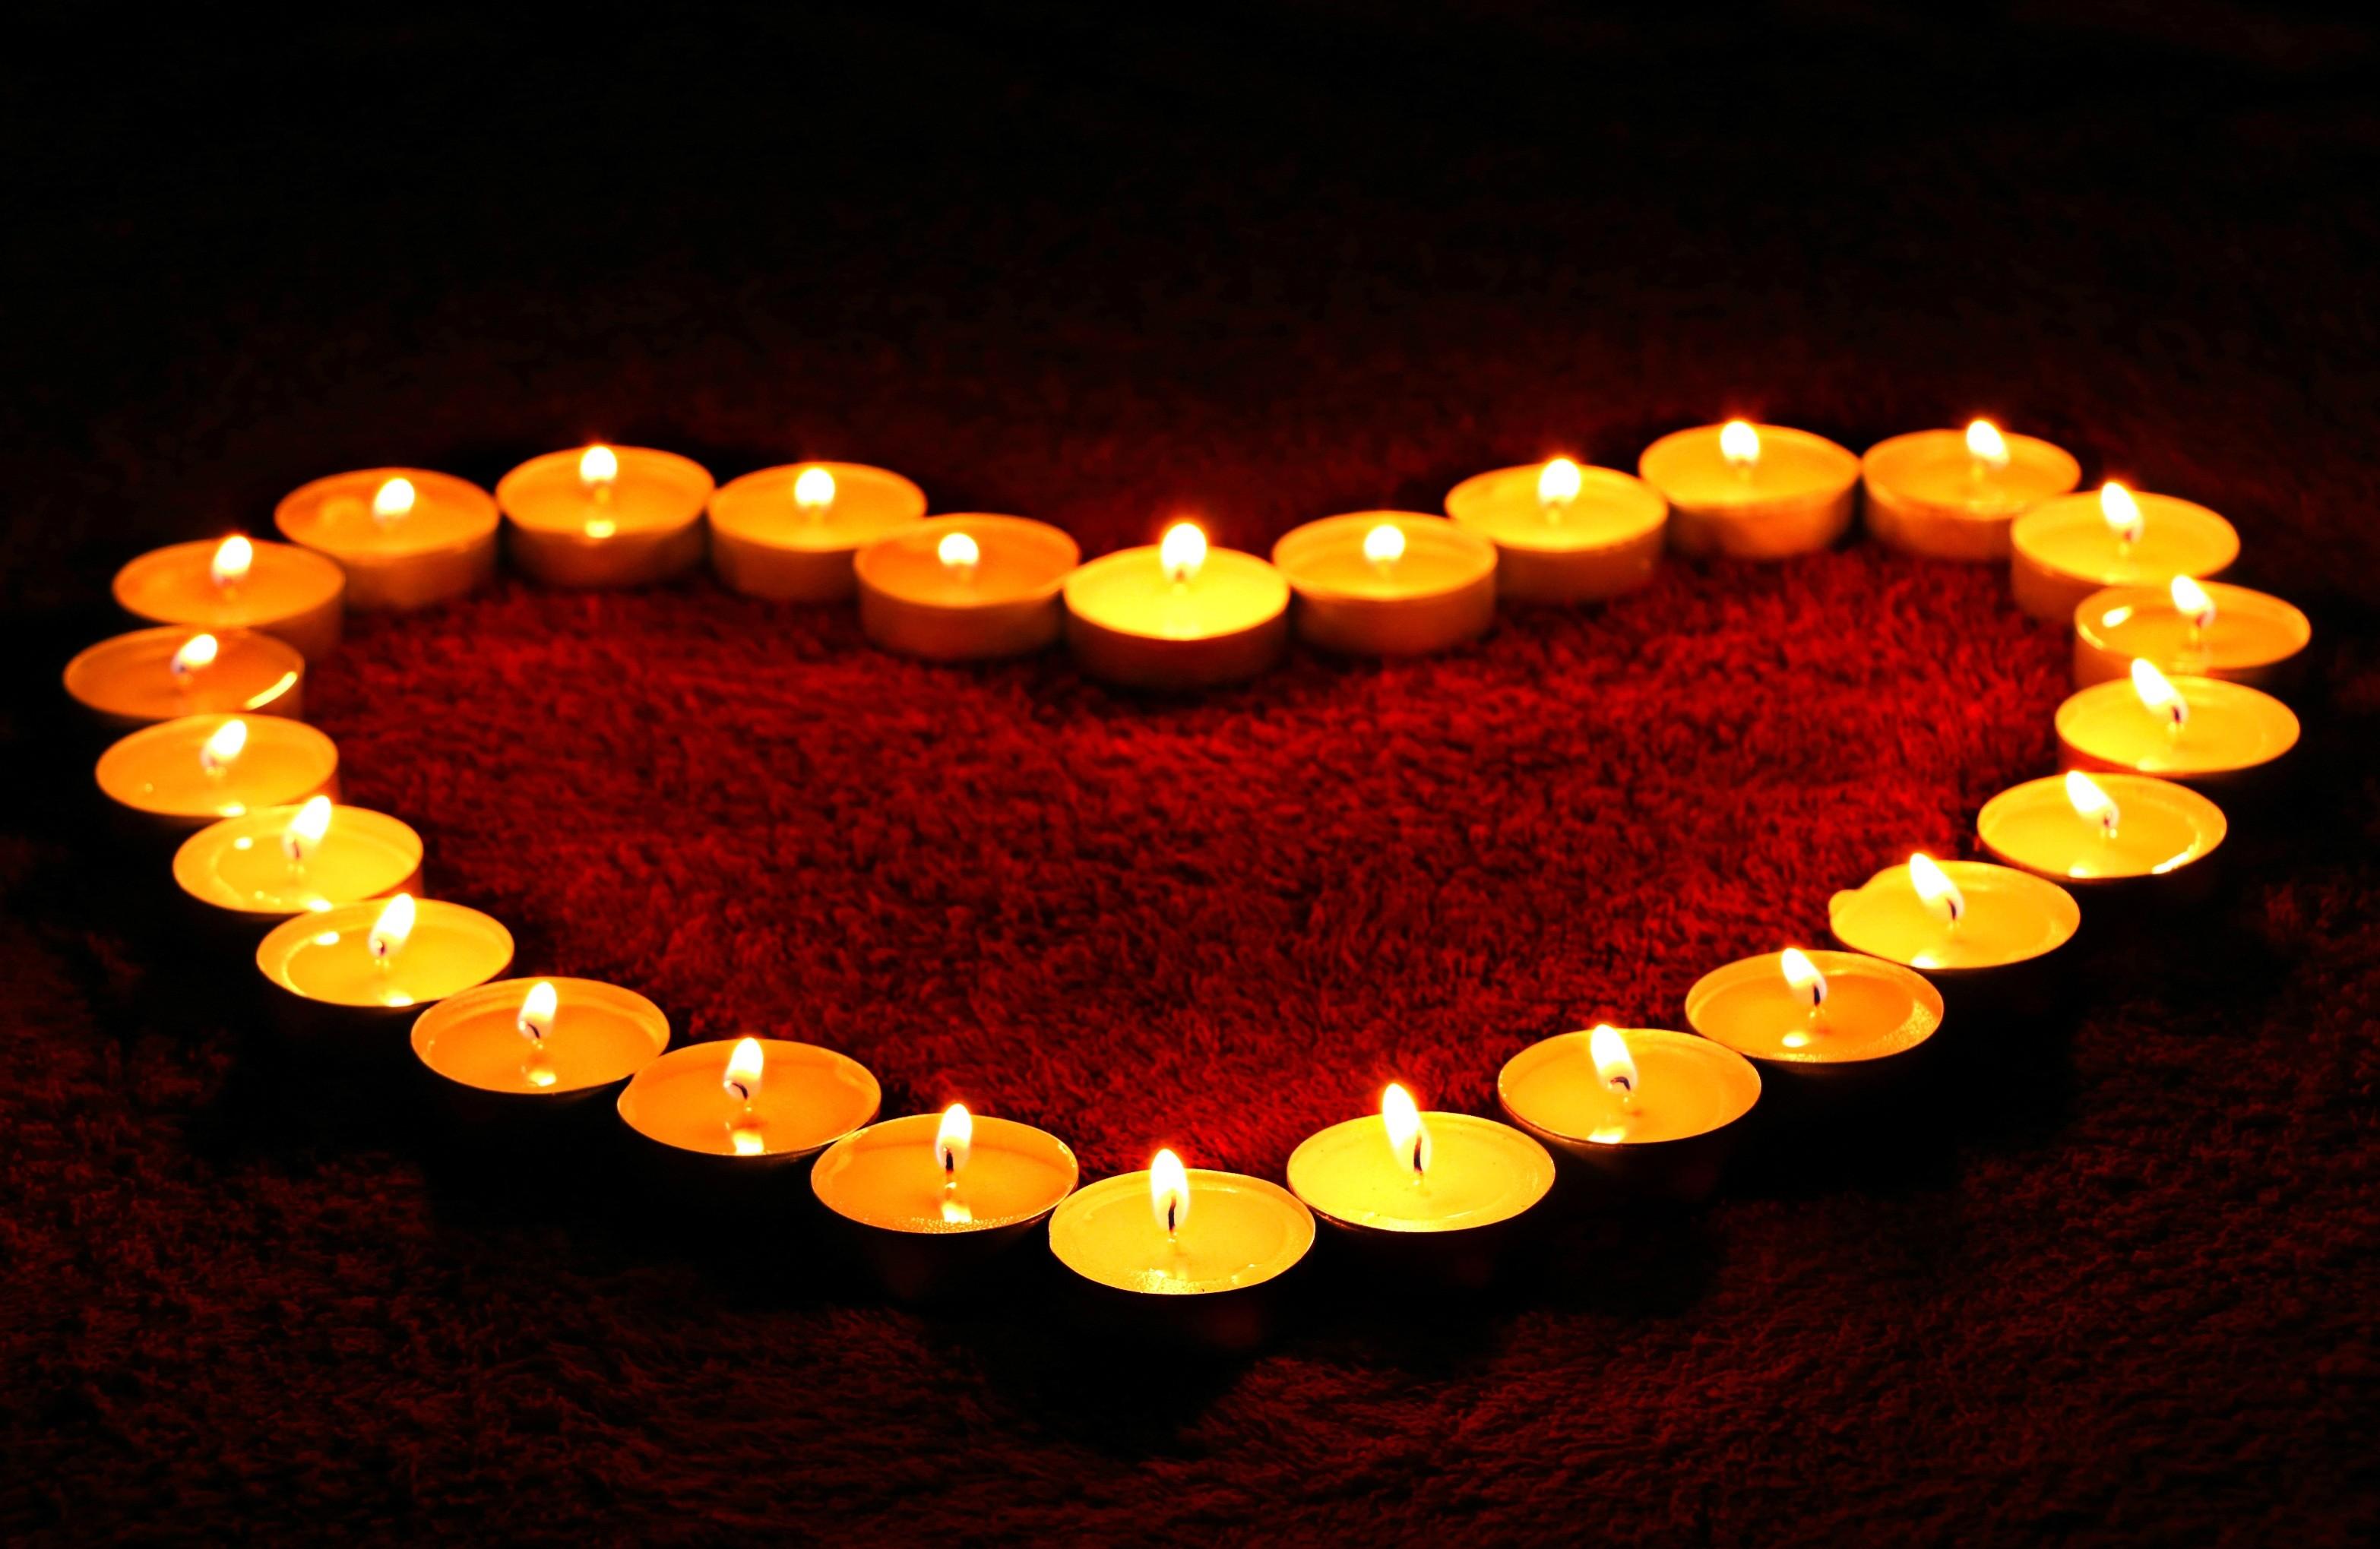 Love heart, Candle lights, HD